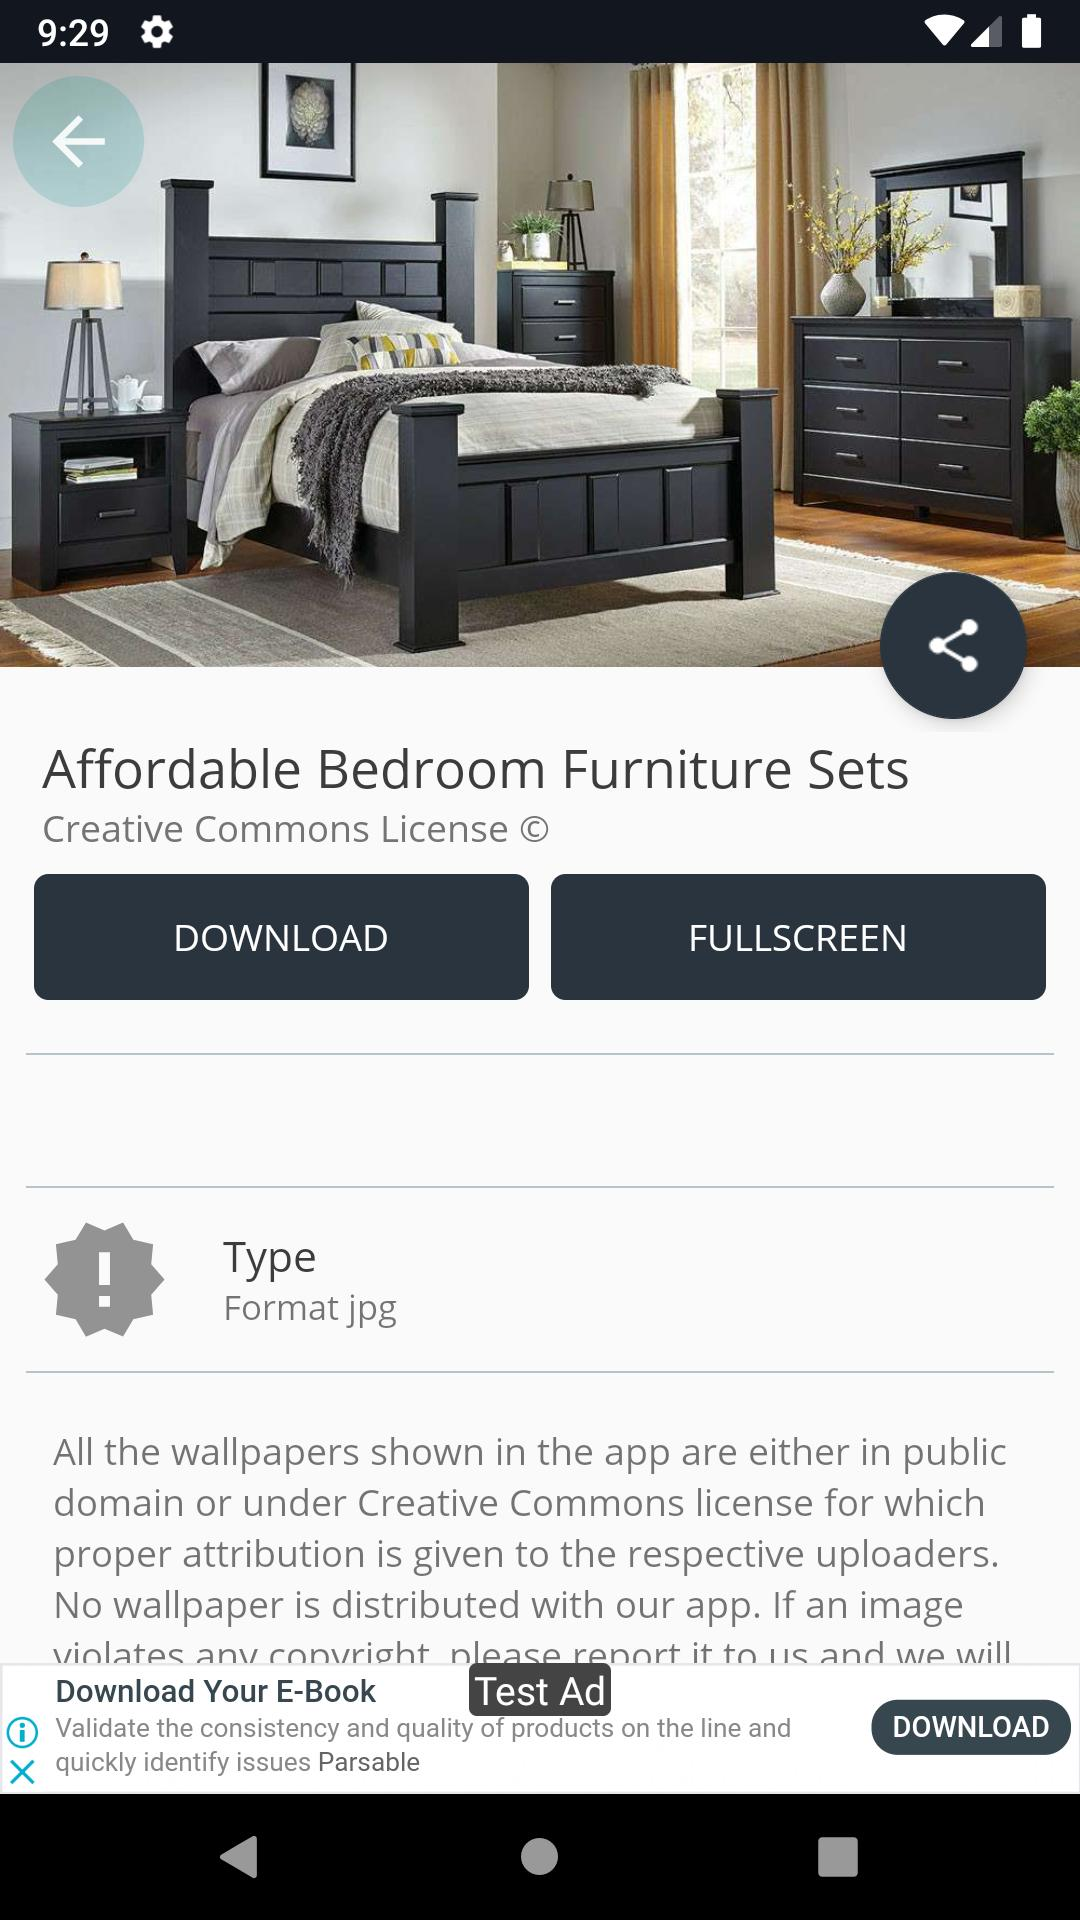 Affordable Bedroom Furniture For Android Apk Download